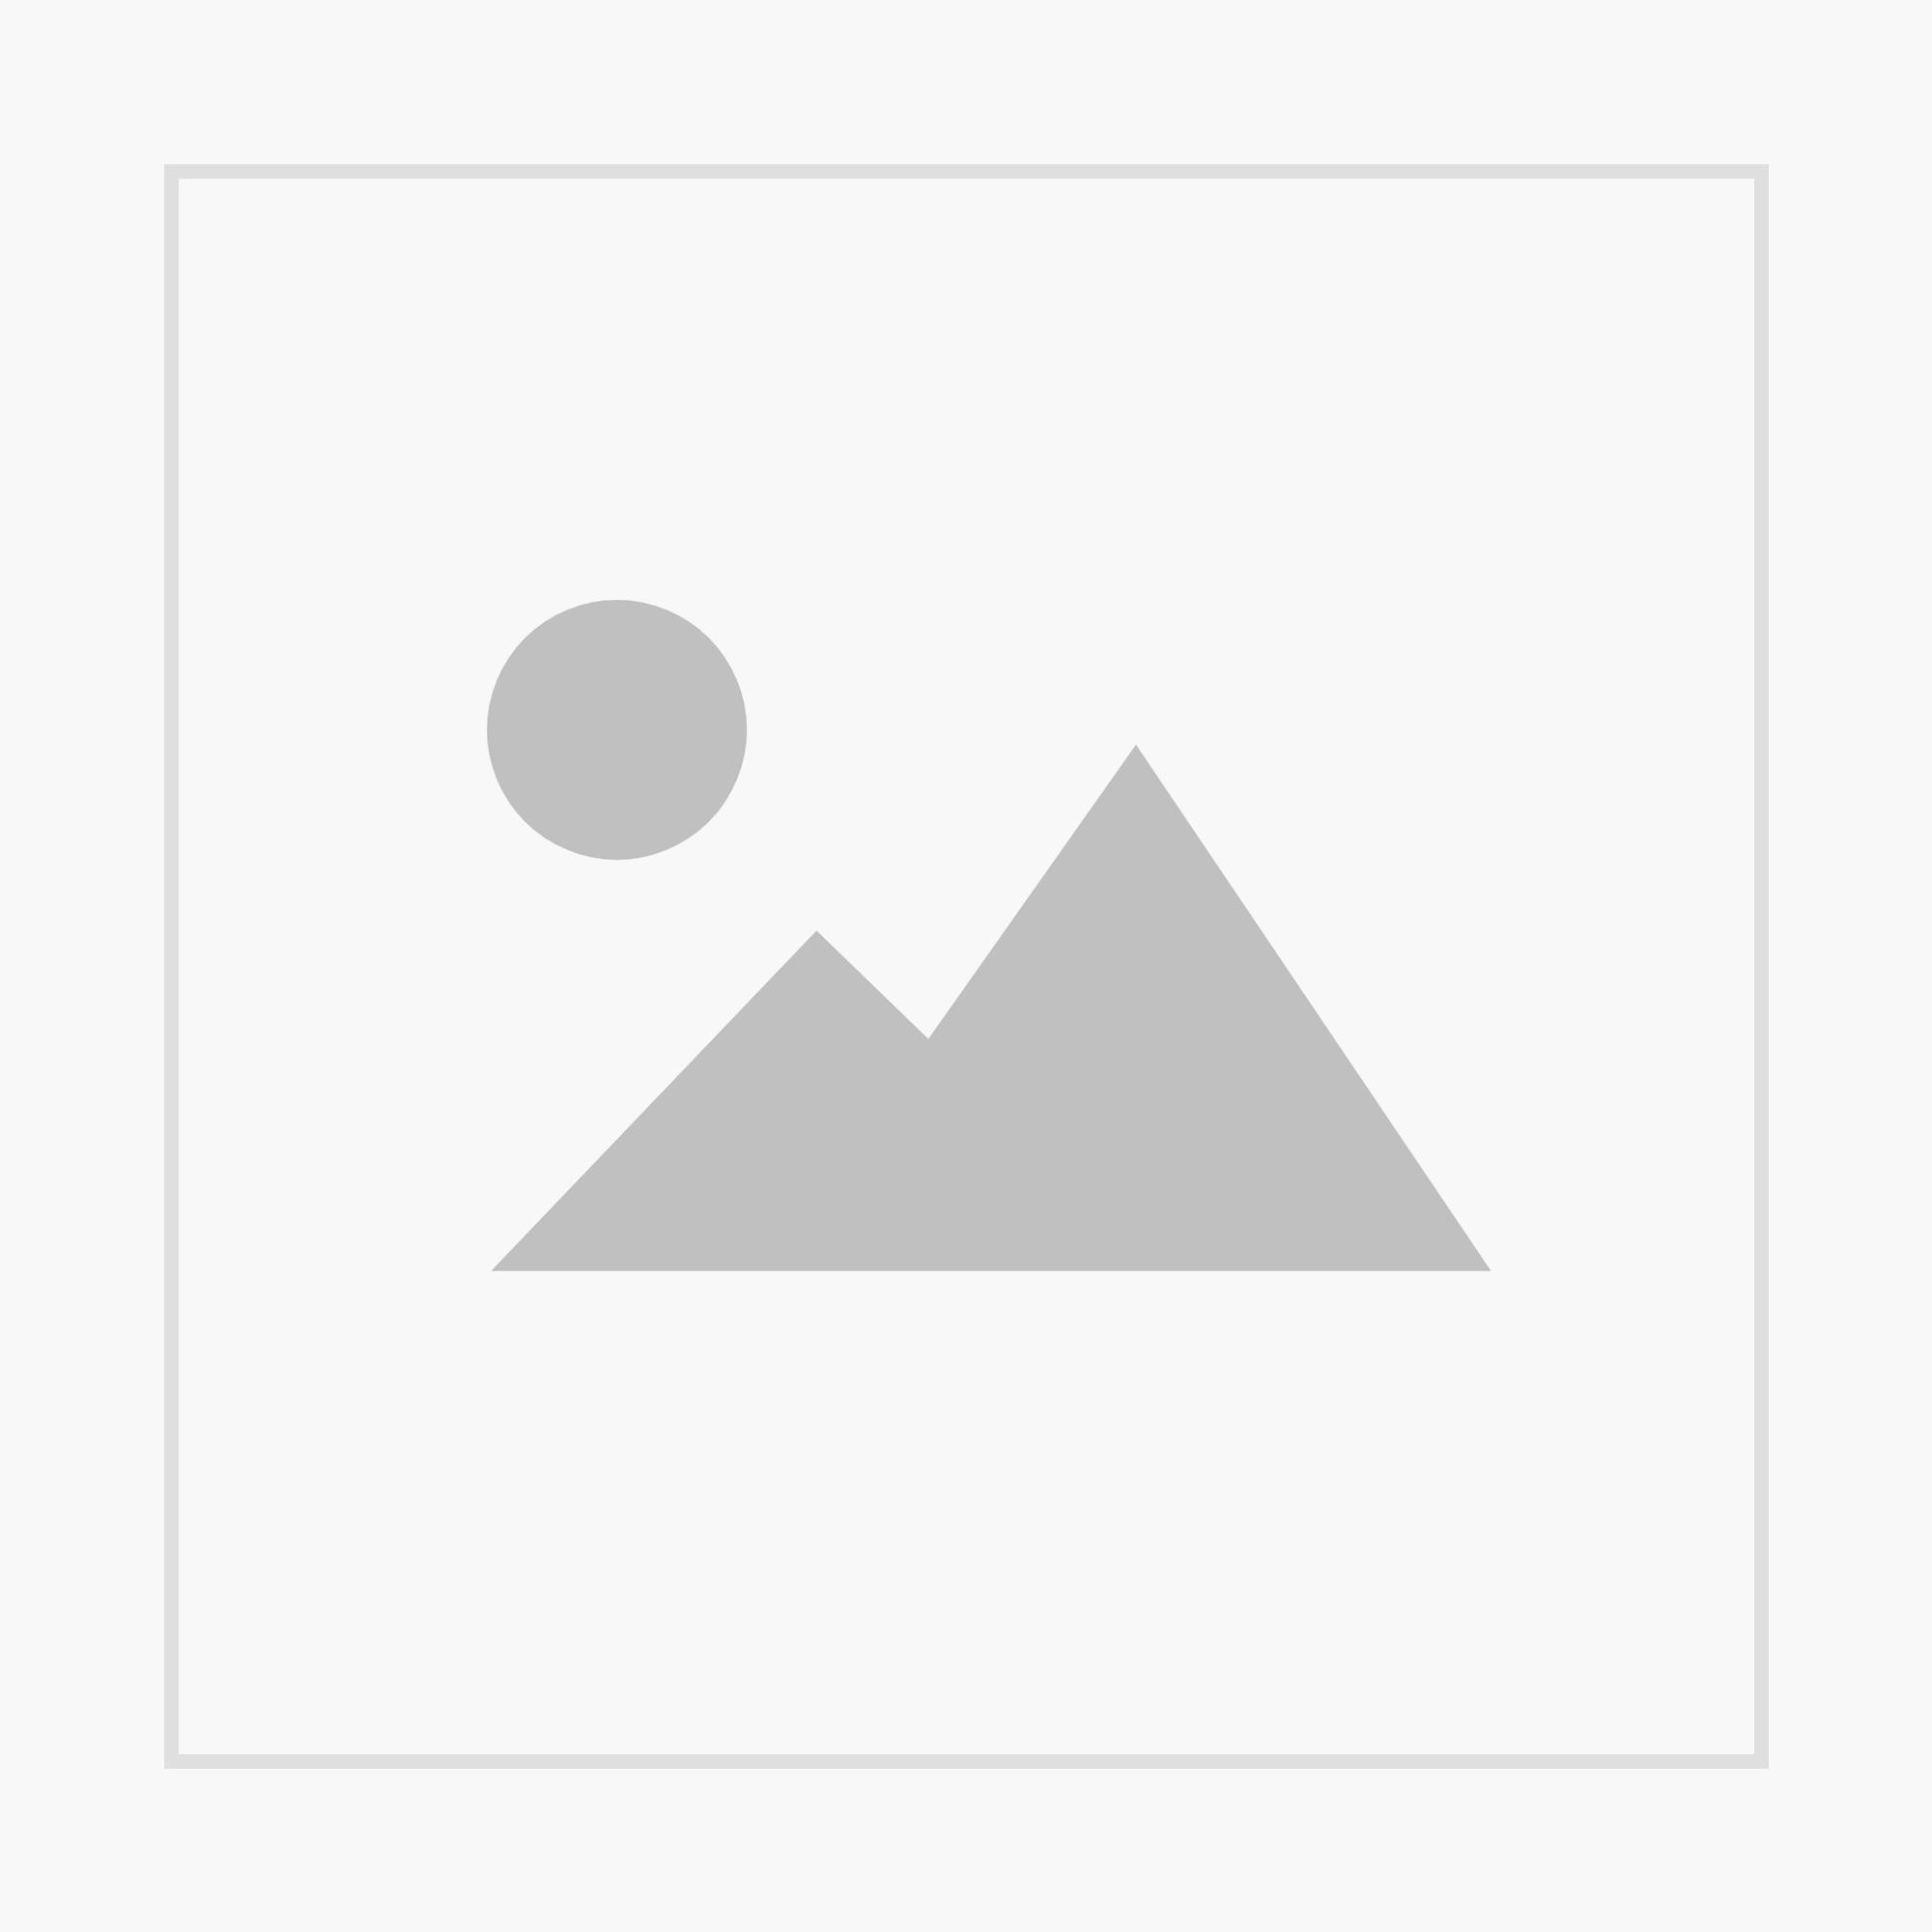 Ecology and Utilisation of Harpogophytum procumbens (Devil's Claw) in Sotuhern Africa. (Plant Species Conservations Monographs 2).